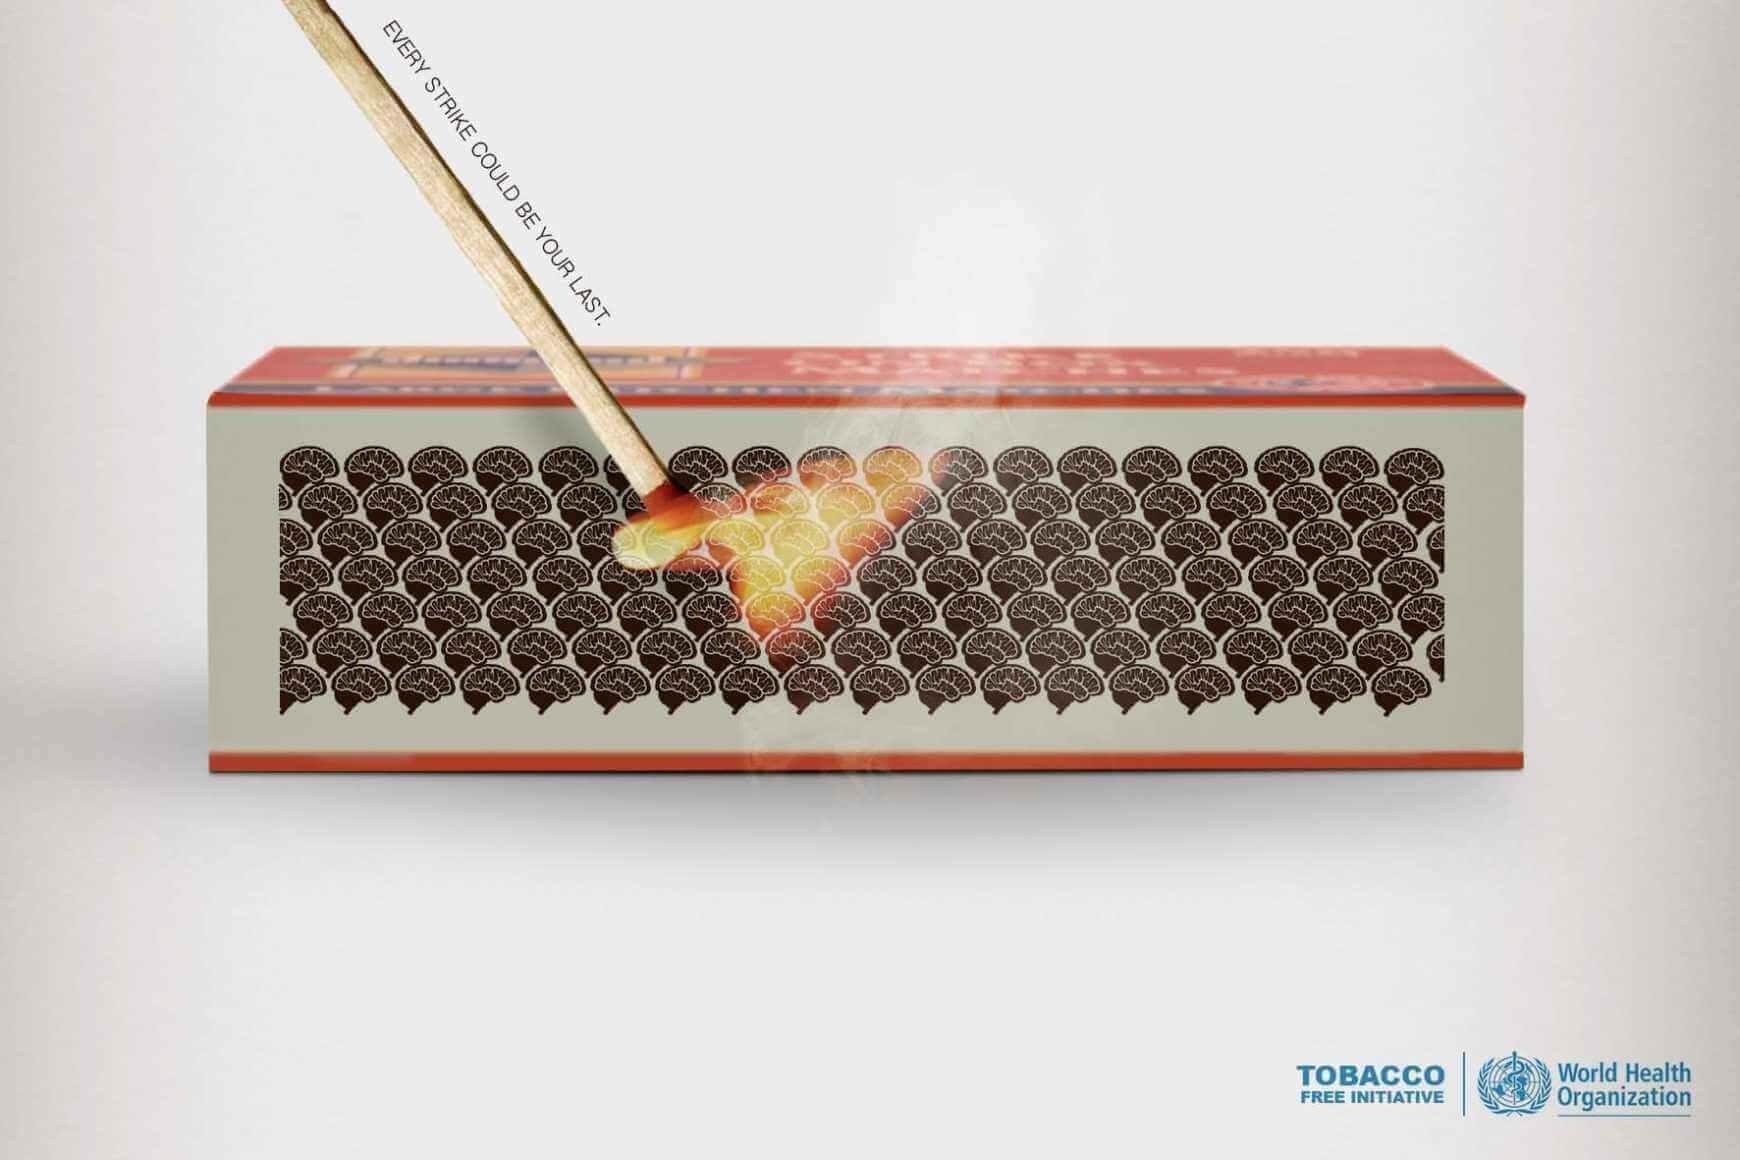 World Health Organization: Adiós al tabaco.